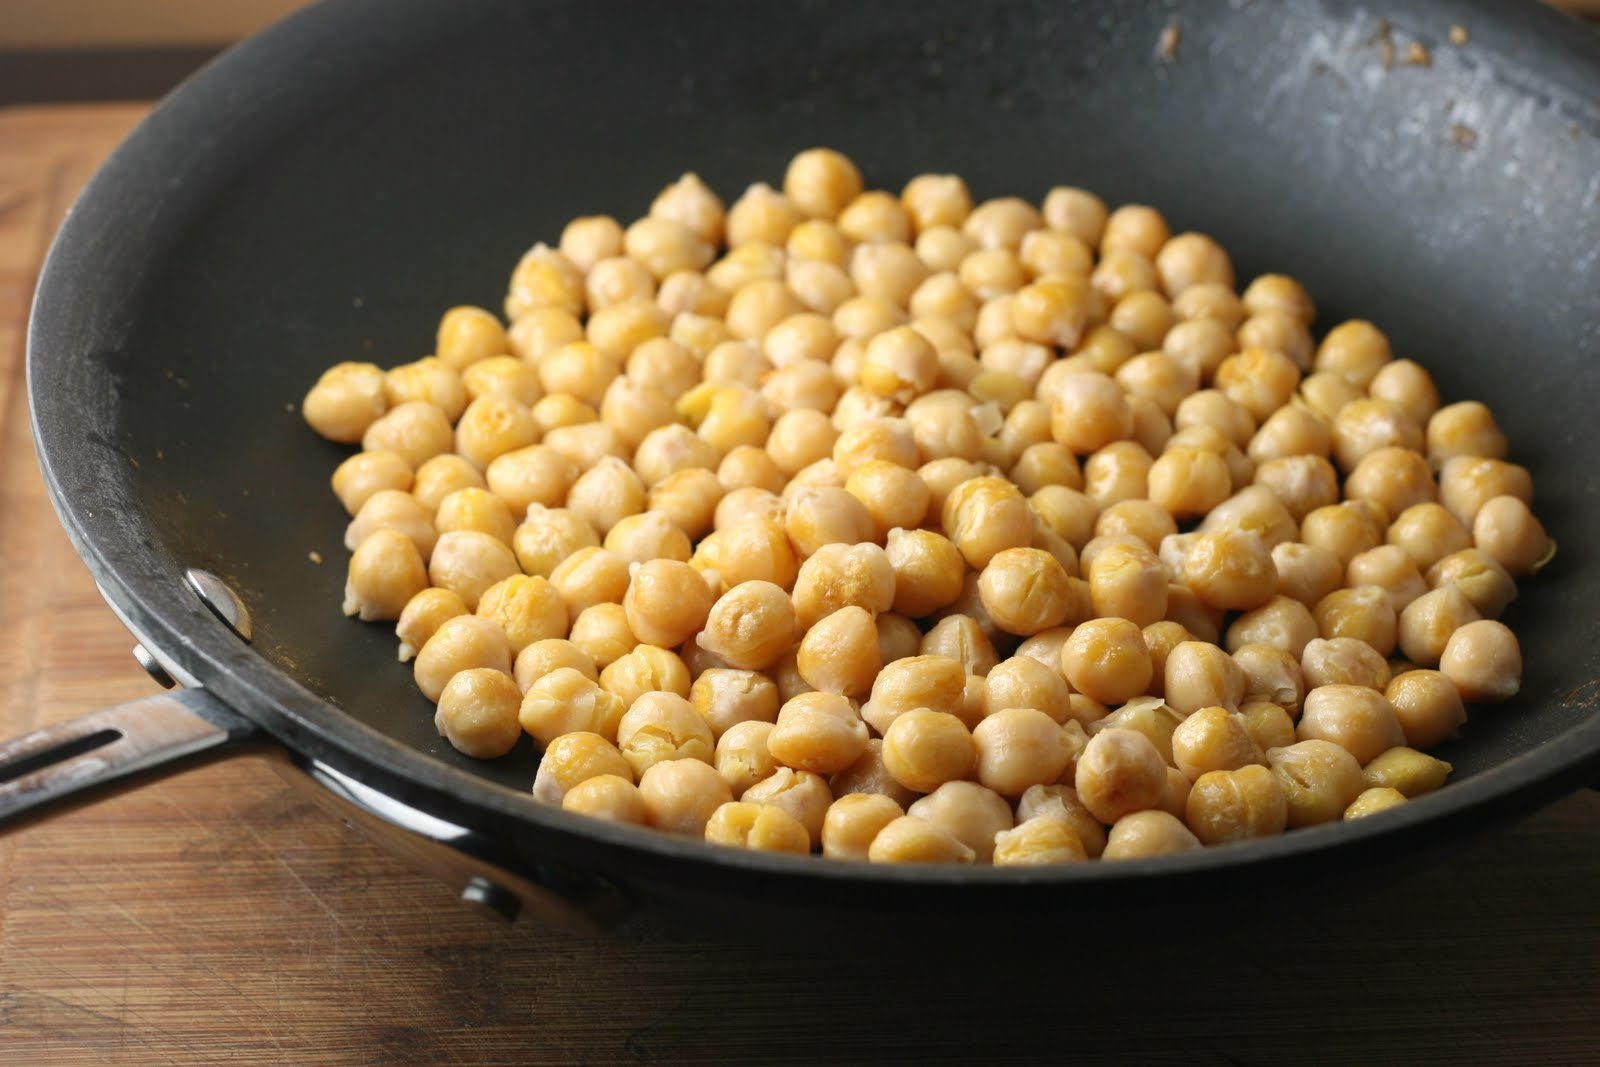 Cheesy-Chick QuesadillasFlorida Coastal Cooking  Wellness